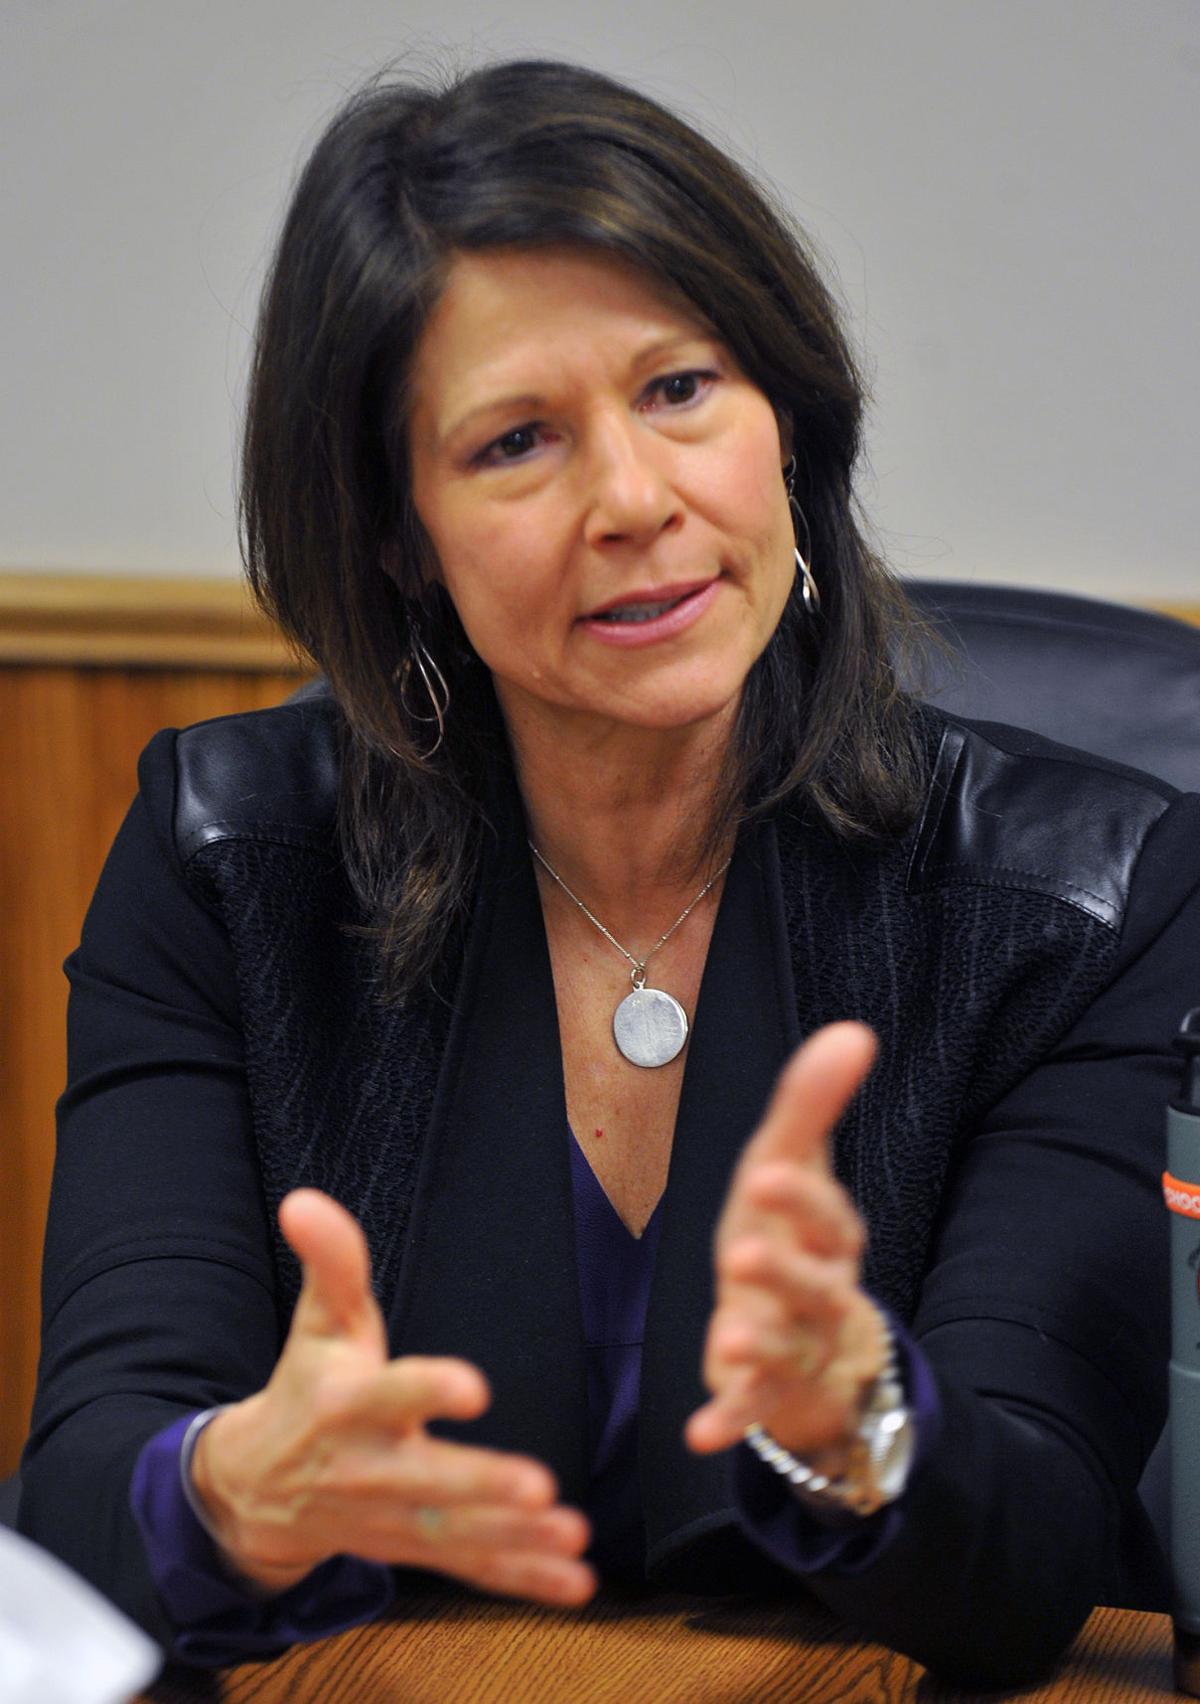 U.S. Rep. Cheri Bustos, D-Moline